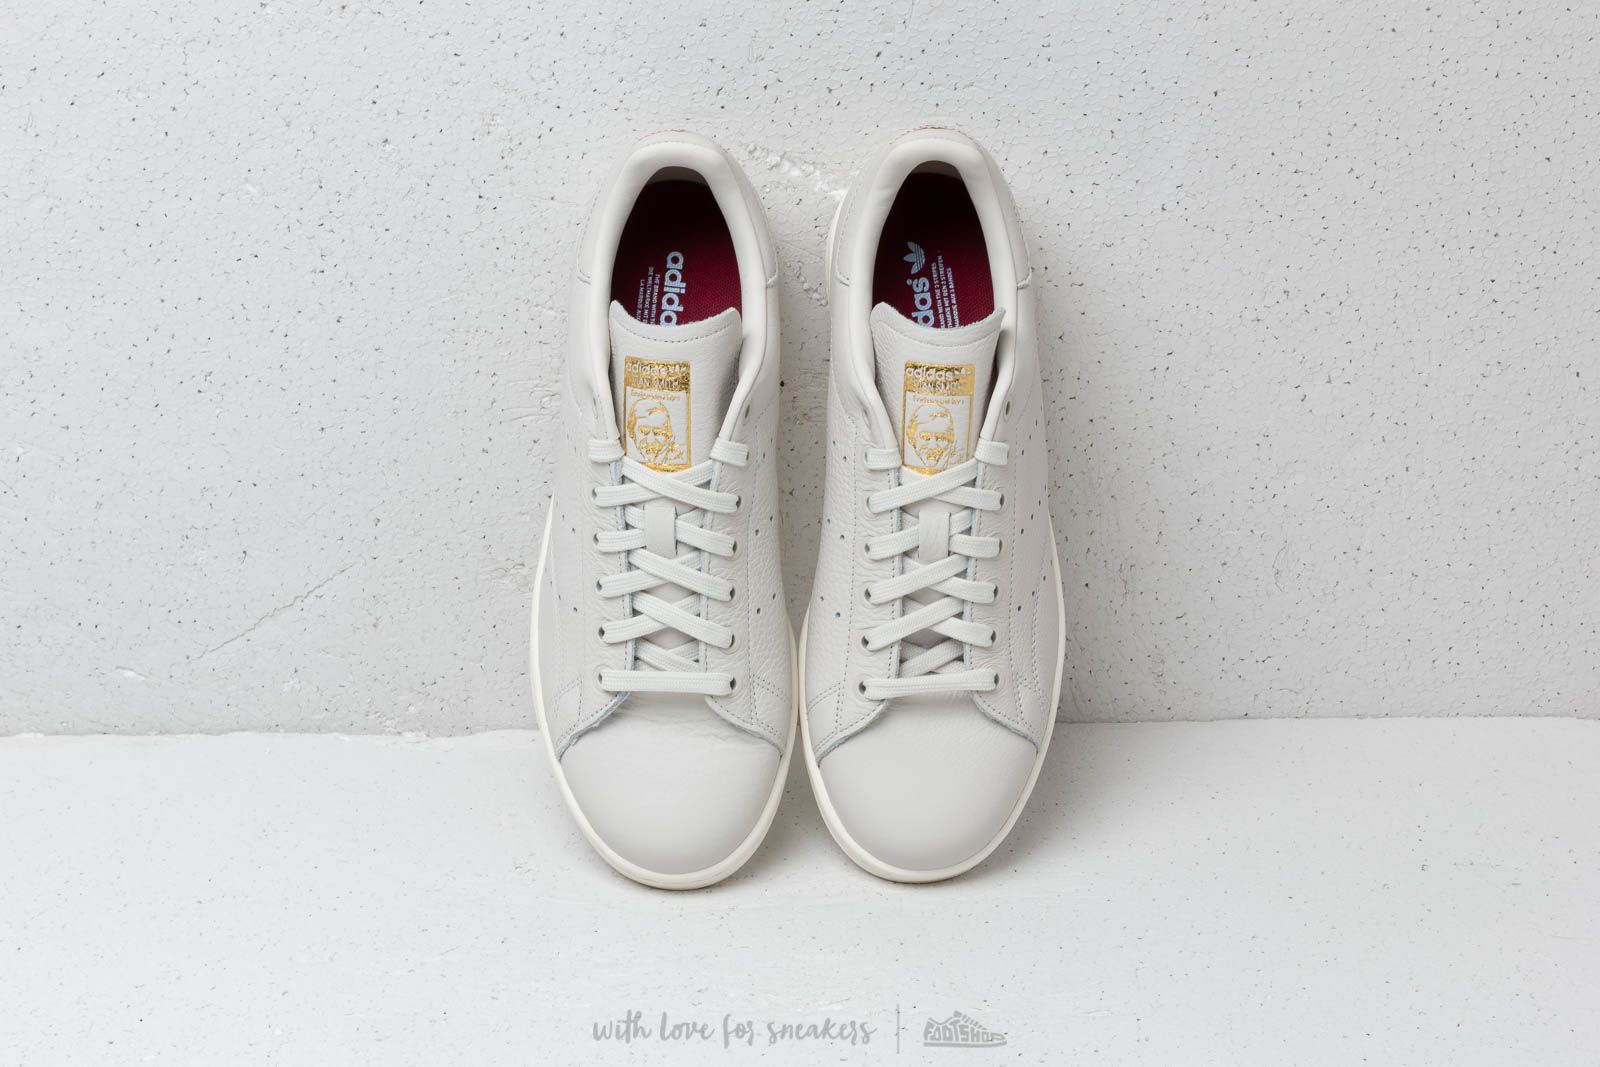 adidas Originals Womens Stan Smith Raw White, Collegiate Burgundy & Periwinkle